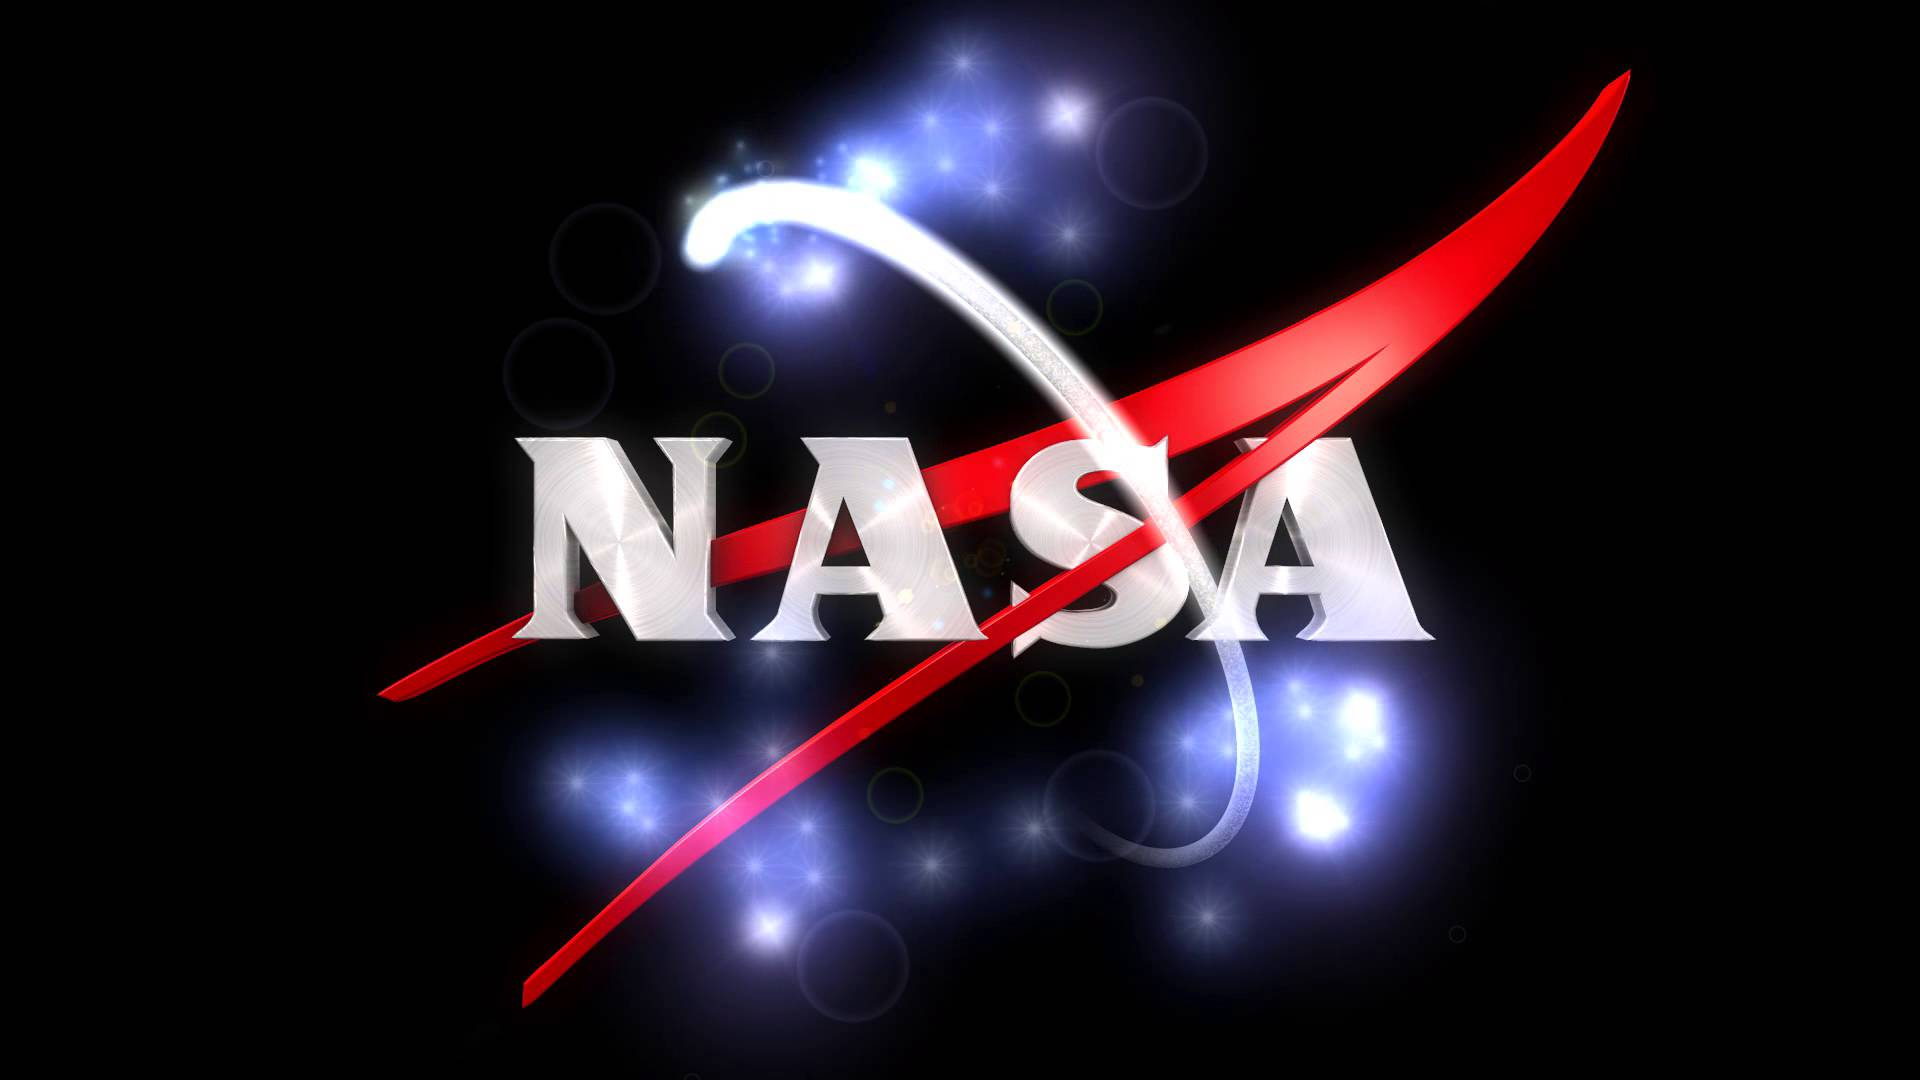 nasa desktop logo - HD1920×1080